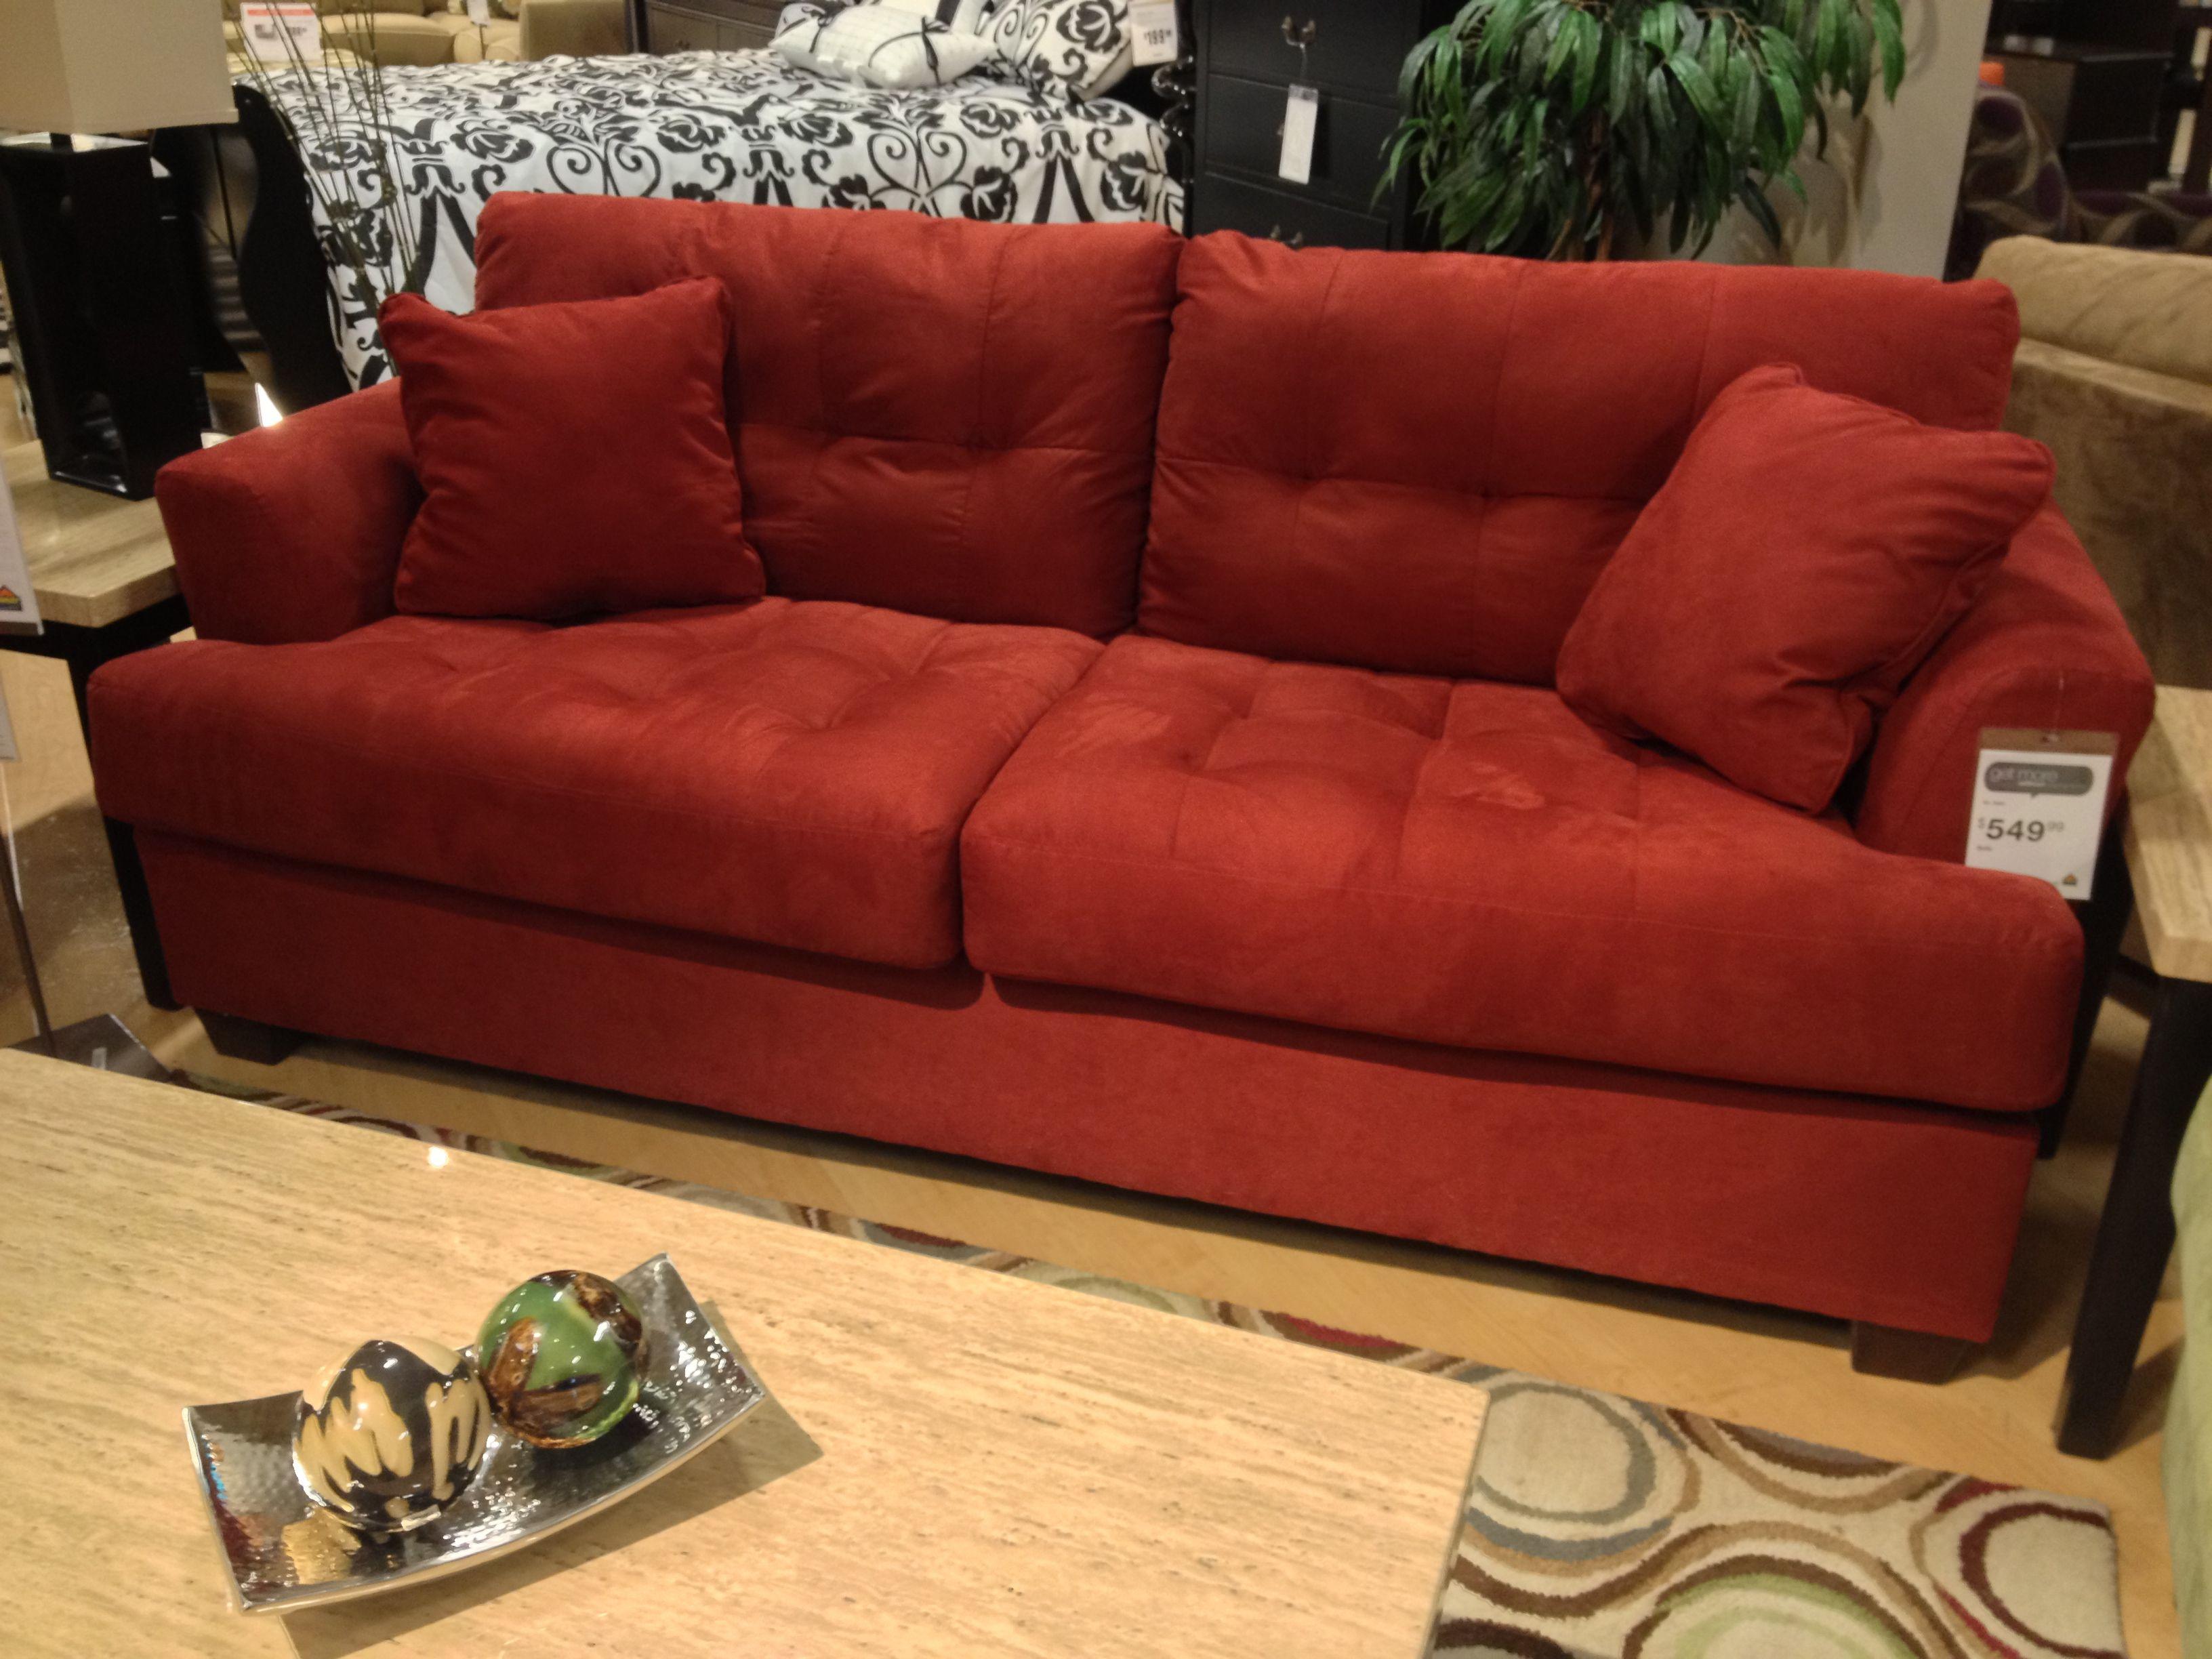 Astonishing Zia Salsa Sofa Ashley Furniture Tricities Metro Modern Home Interior And Landscaping Eliaenasavecom